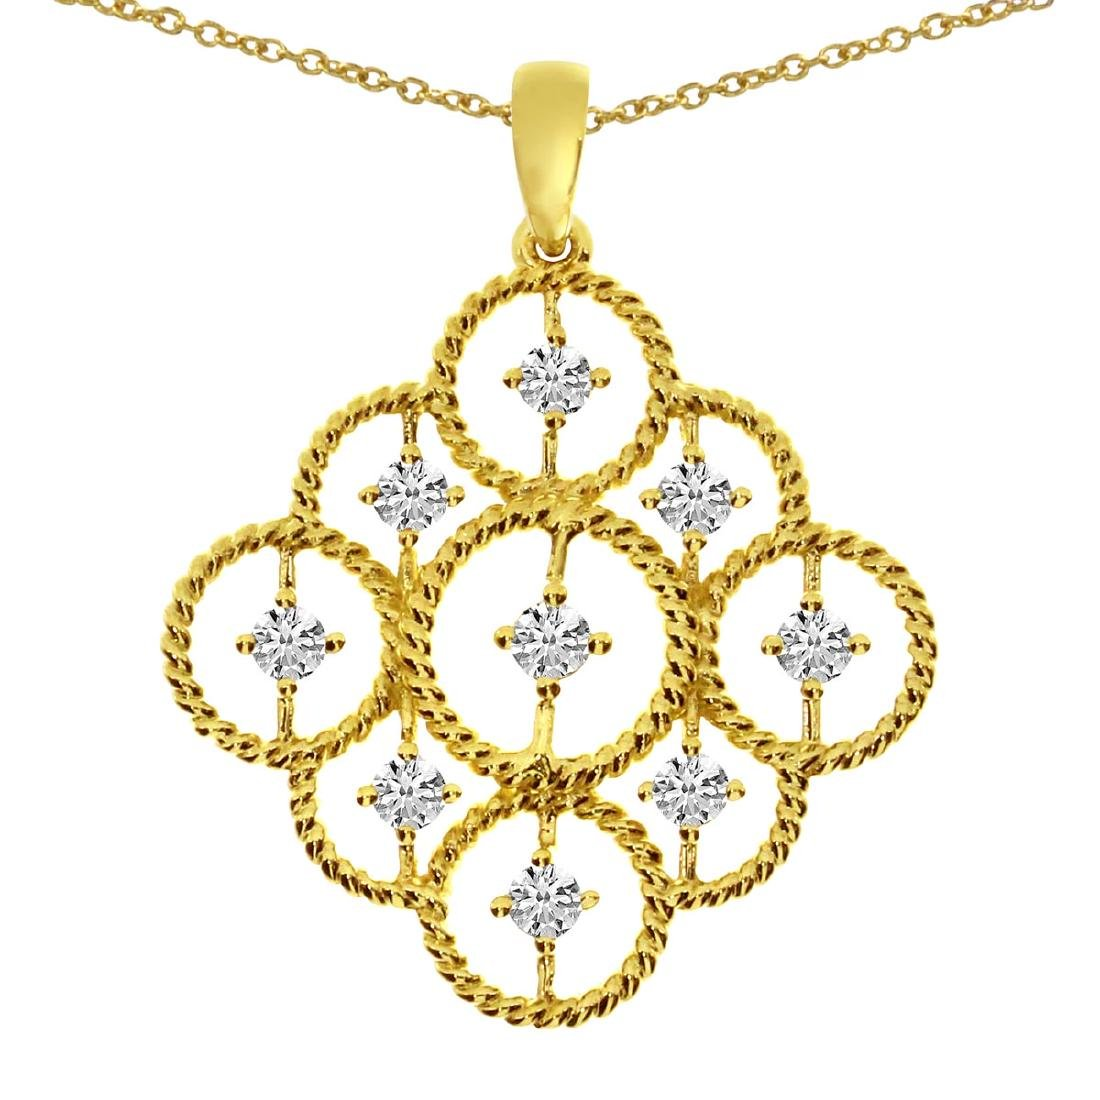 Certified 14K Yellow Gold Rope Diamond Pendant 0.41 CTW